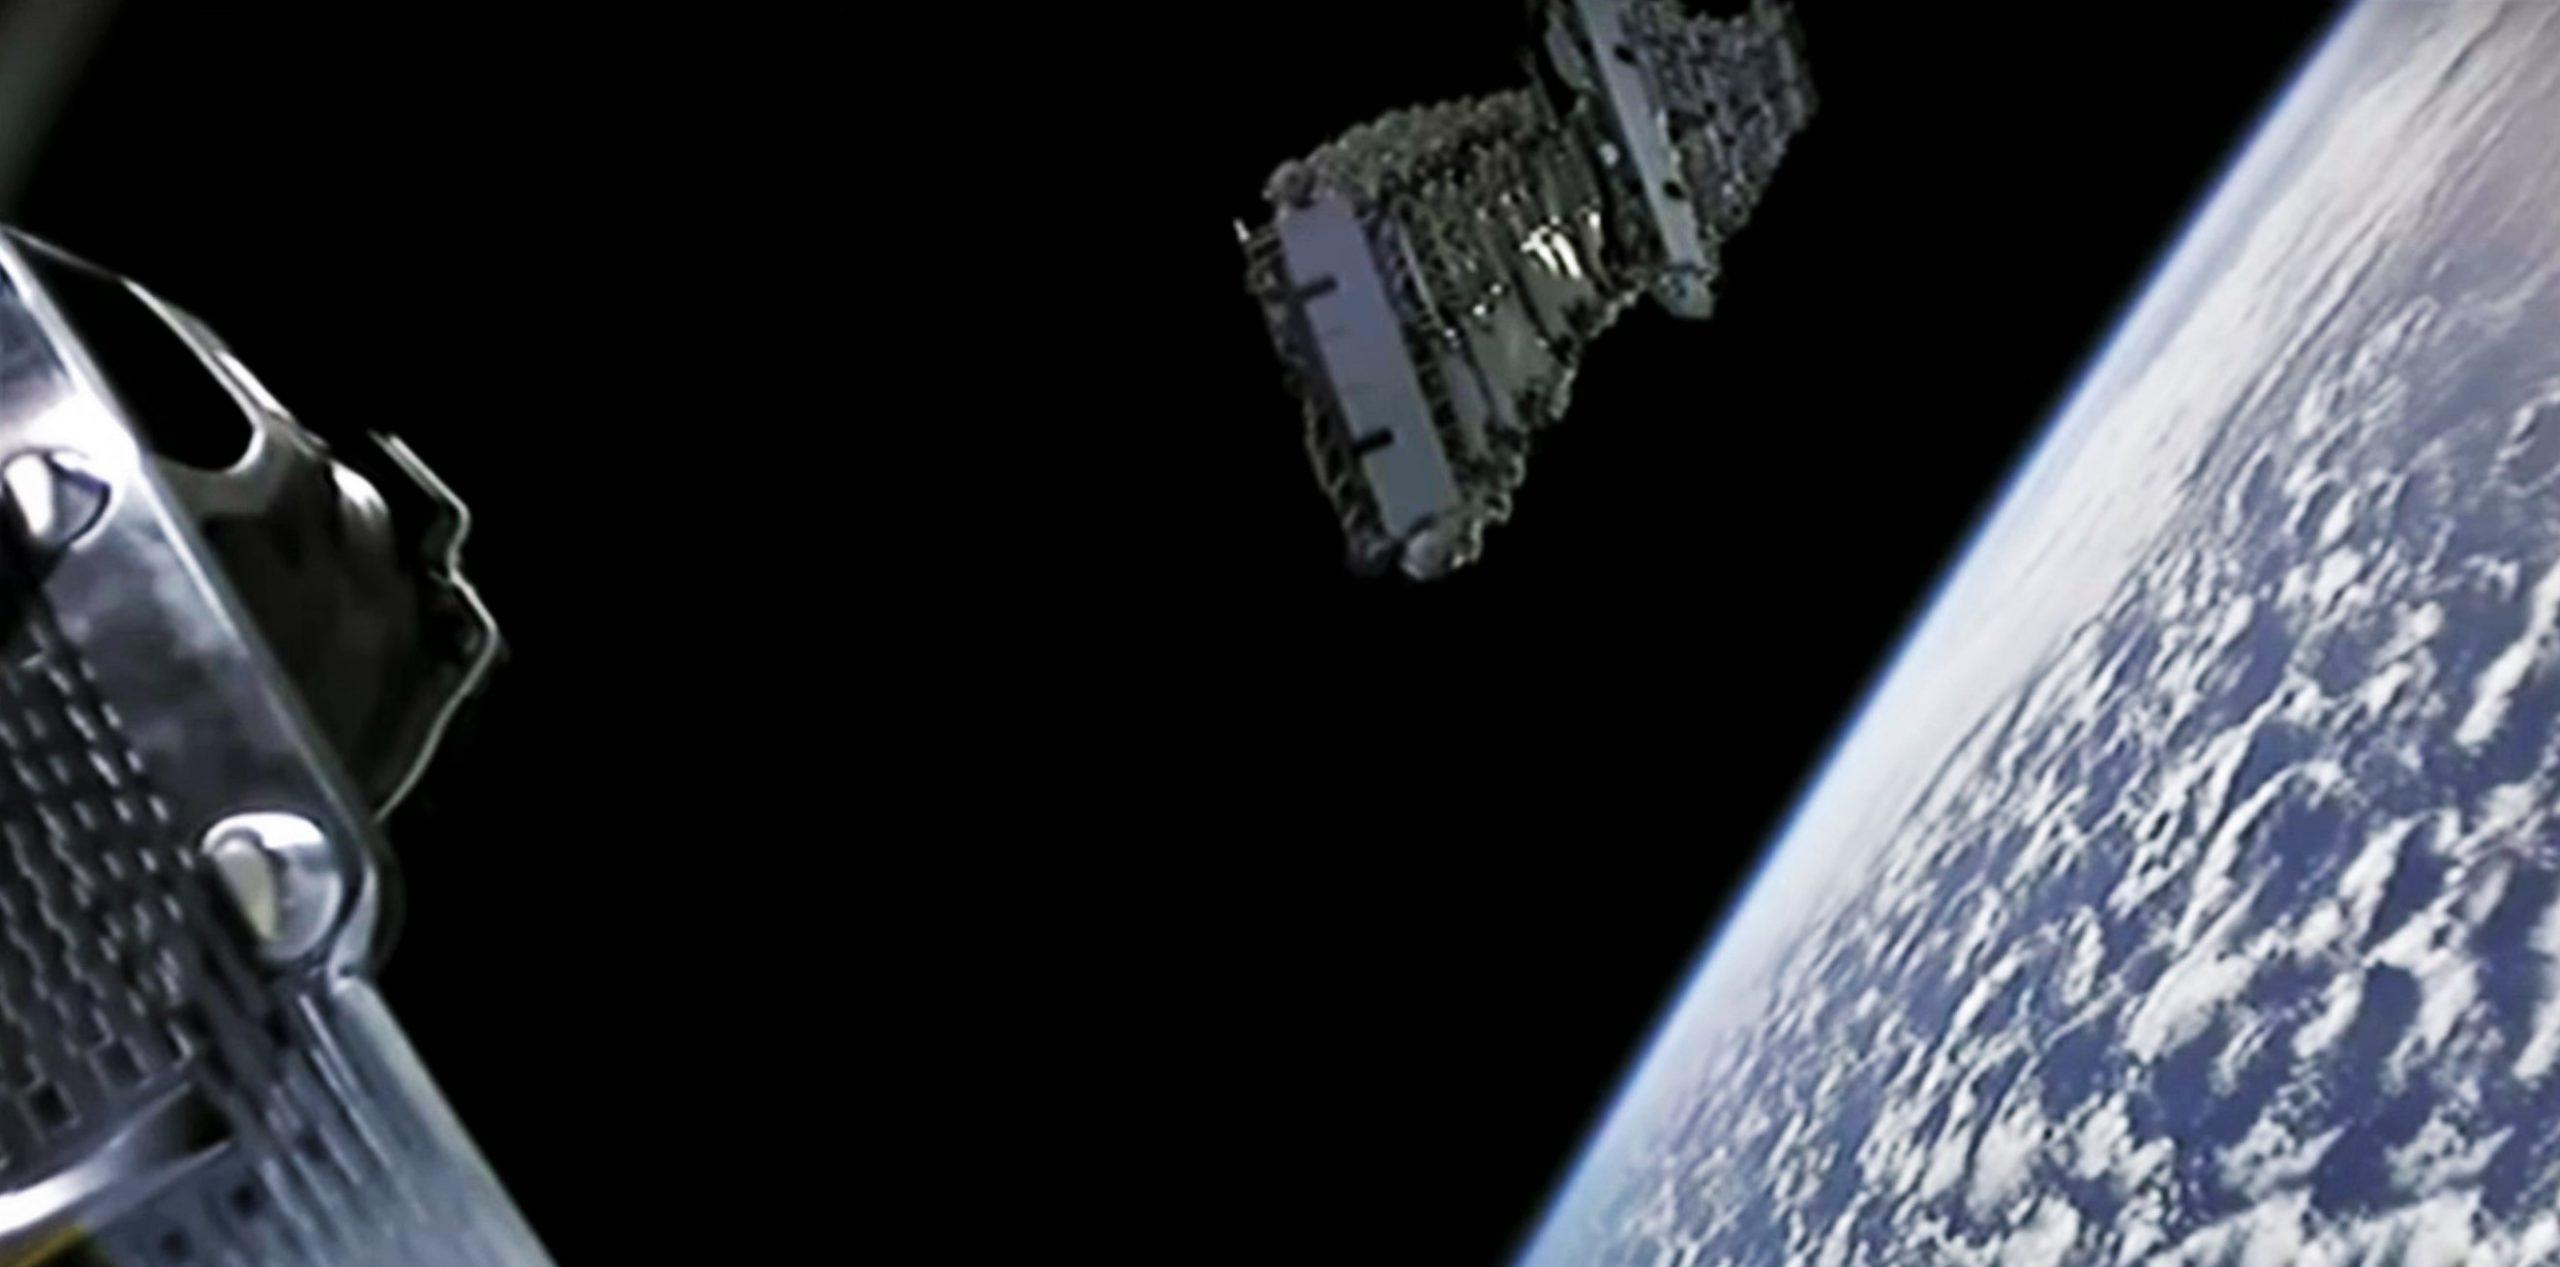 Starlink V1 L5 webcast 031820 (SpaceX) deploy 3